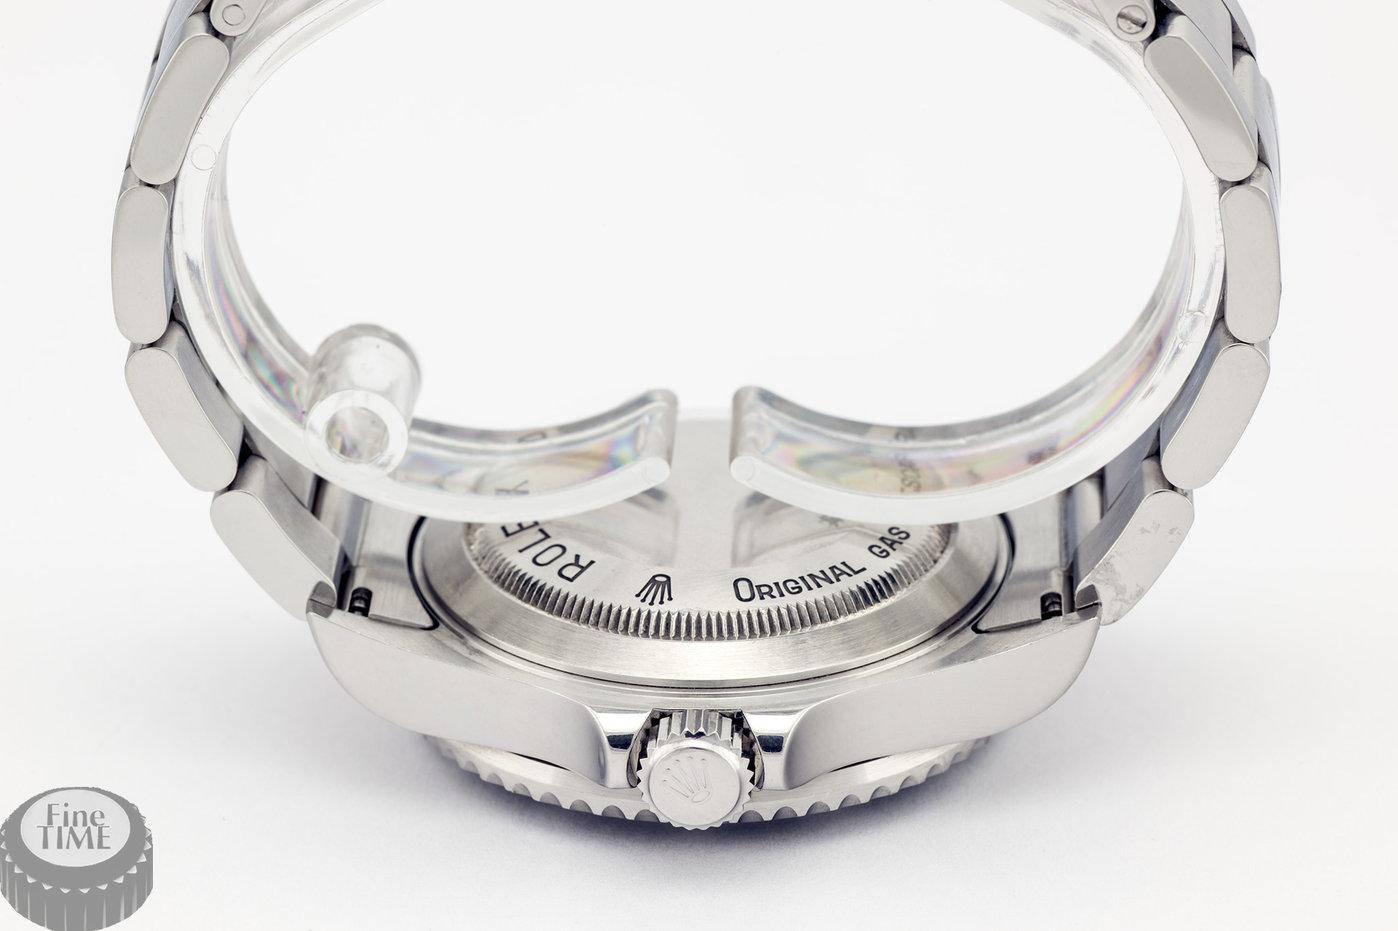 rolex-seadweller-16600-m-05.jpg